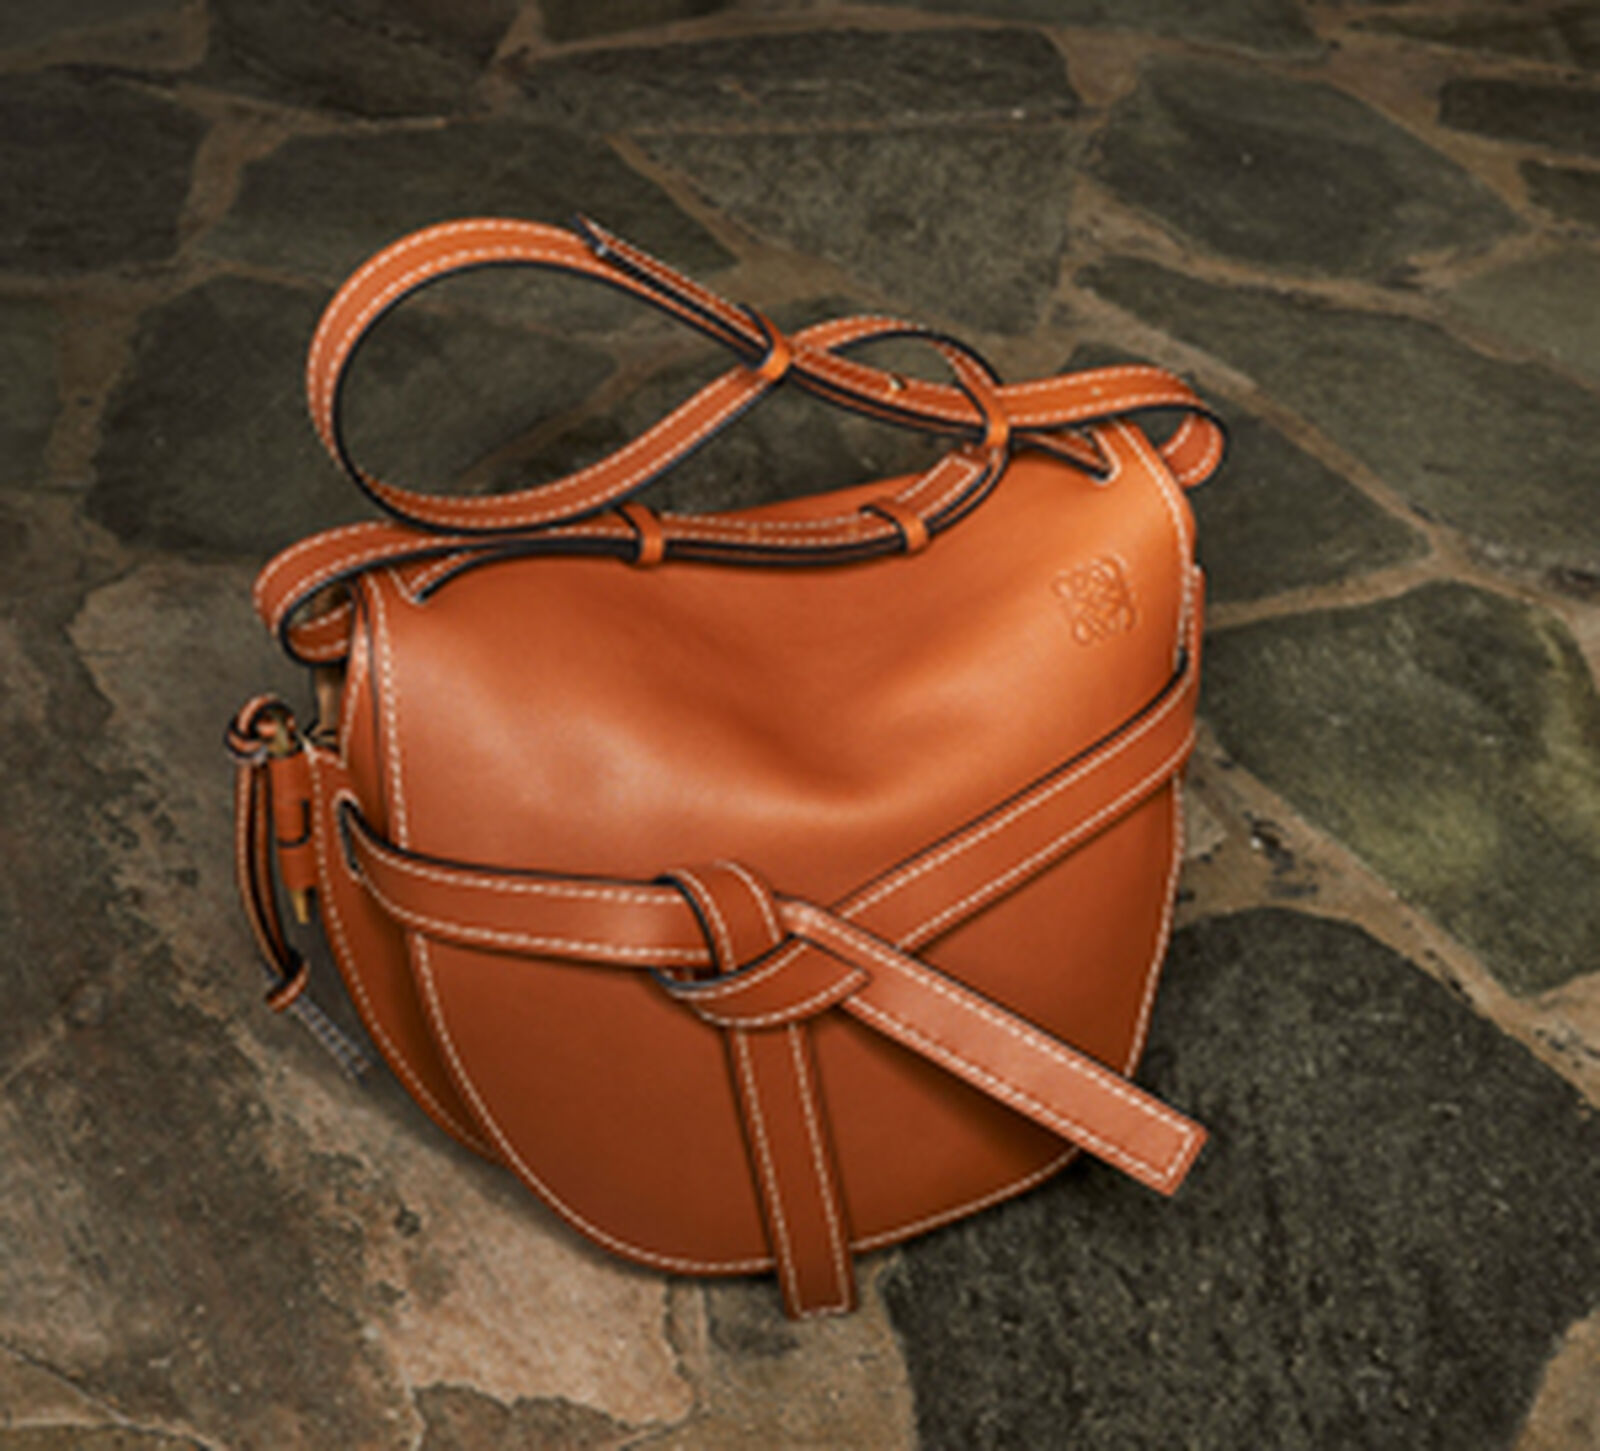 Shop the Gate Bag